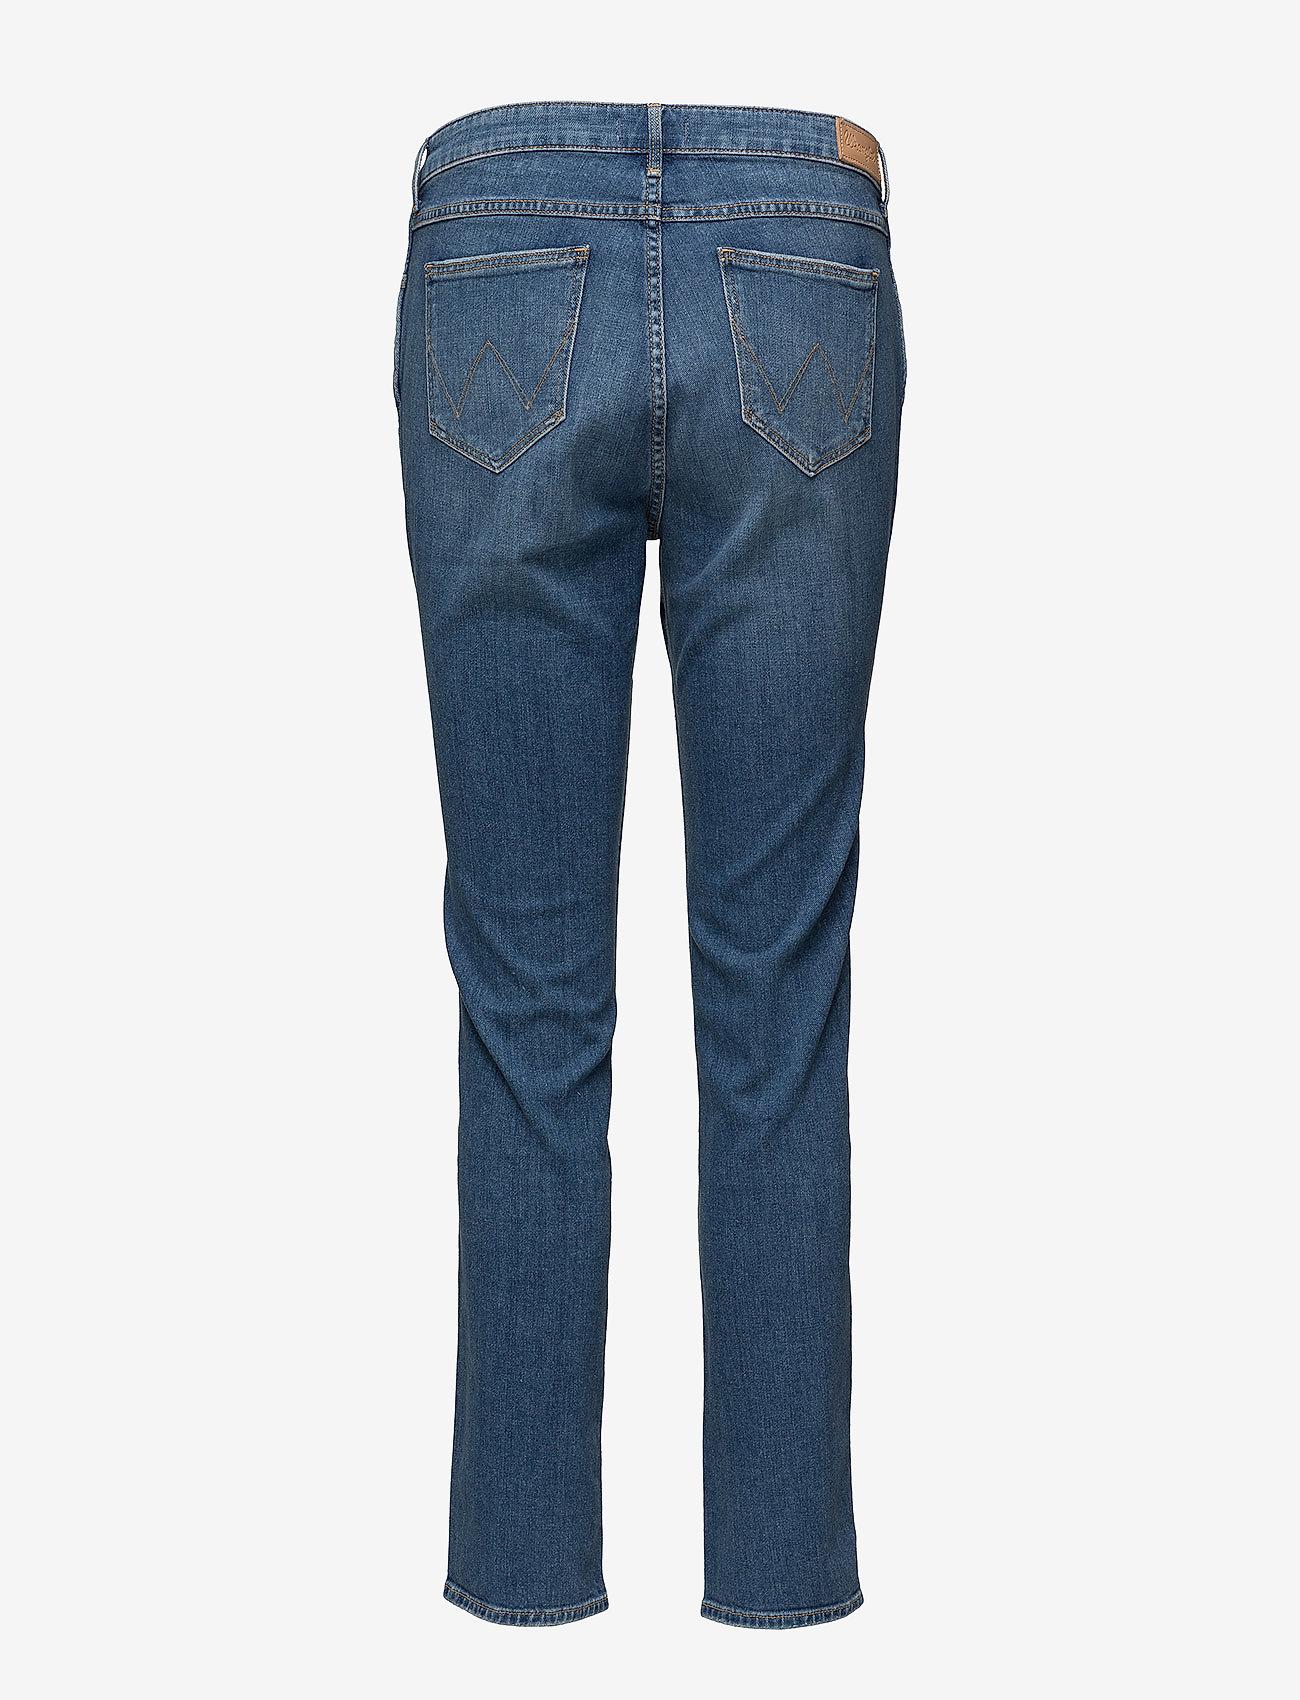 Wrangler - BOYFRIEND - boyfriend jeans - soft worn - 1